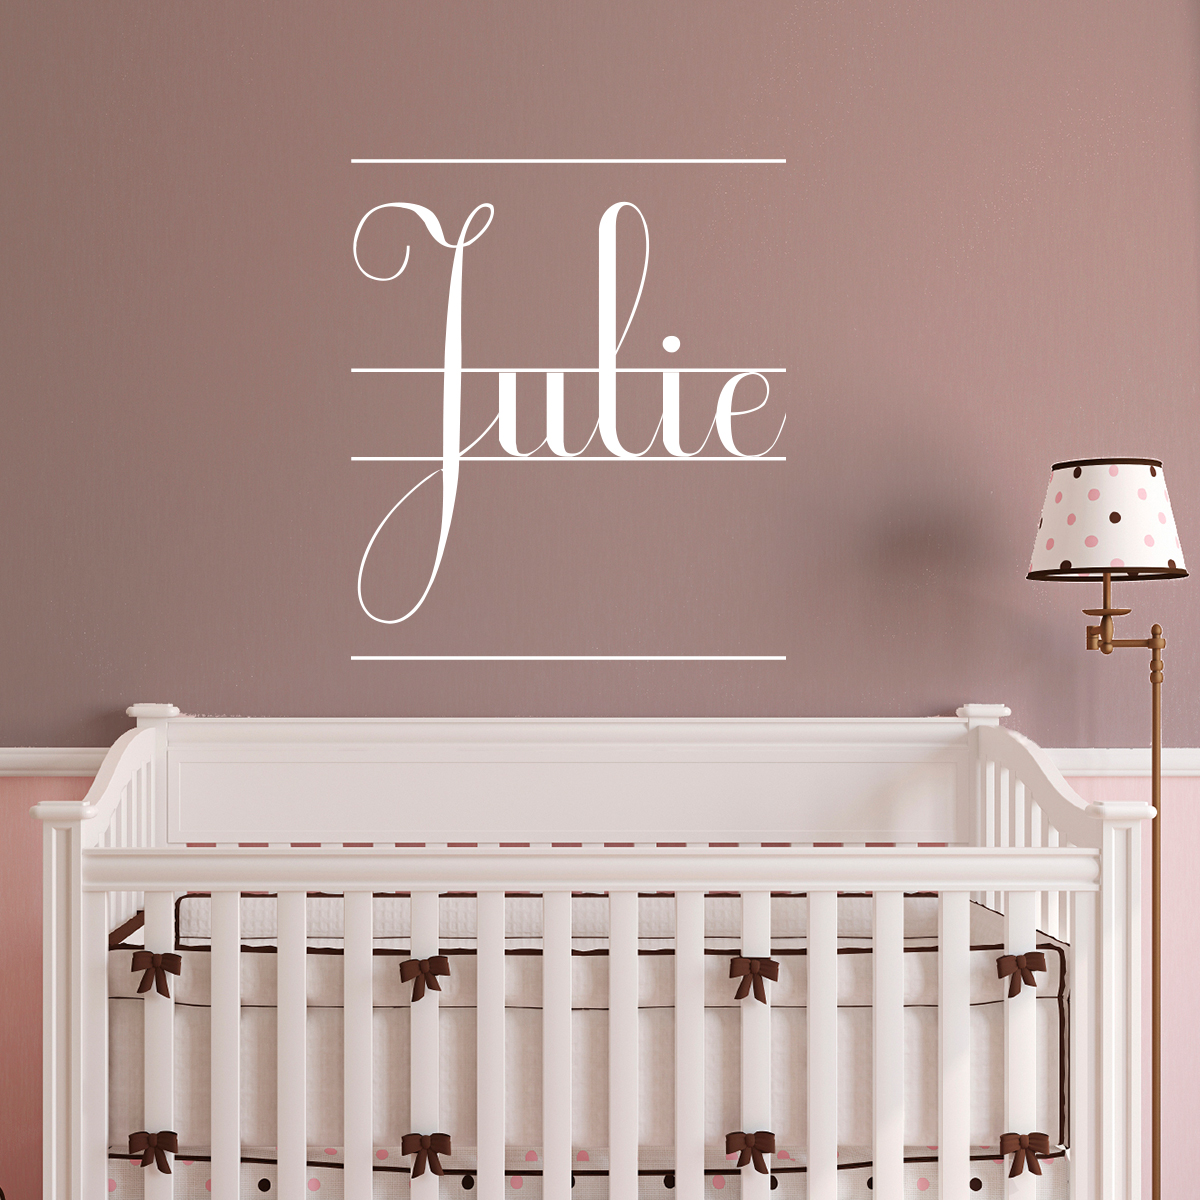 sticker pr nom personnalisable scolaire chouette. Black Bedroom Furniture Sets. Home Design Ideas